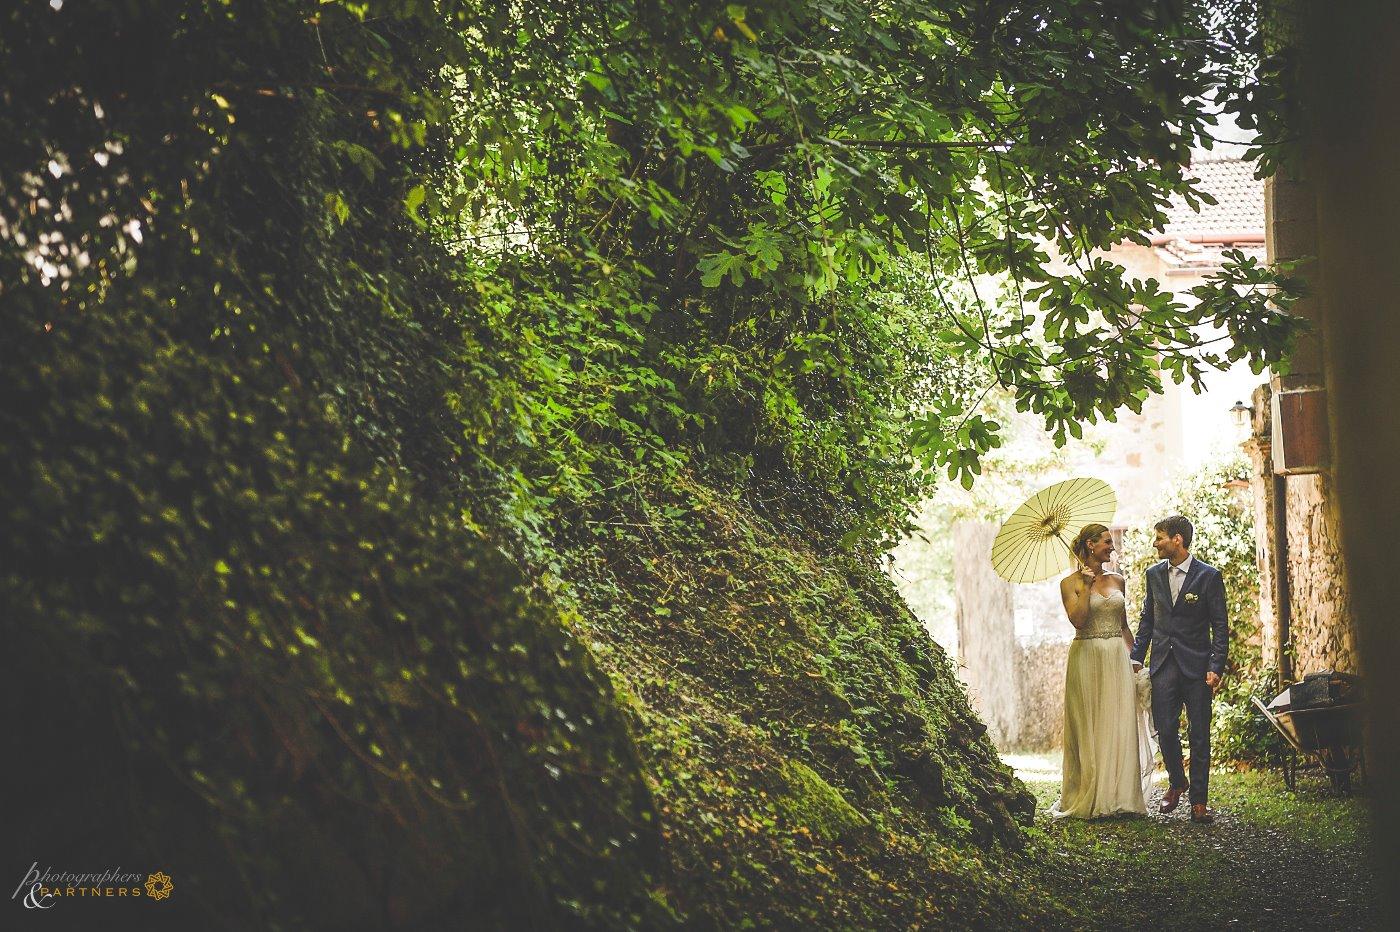 photography_weddings_bagni_lucca_16.jpg